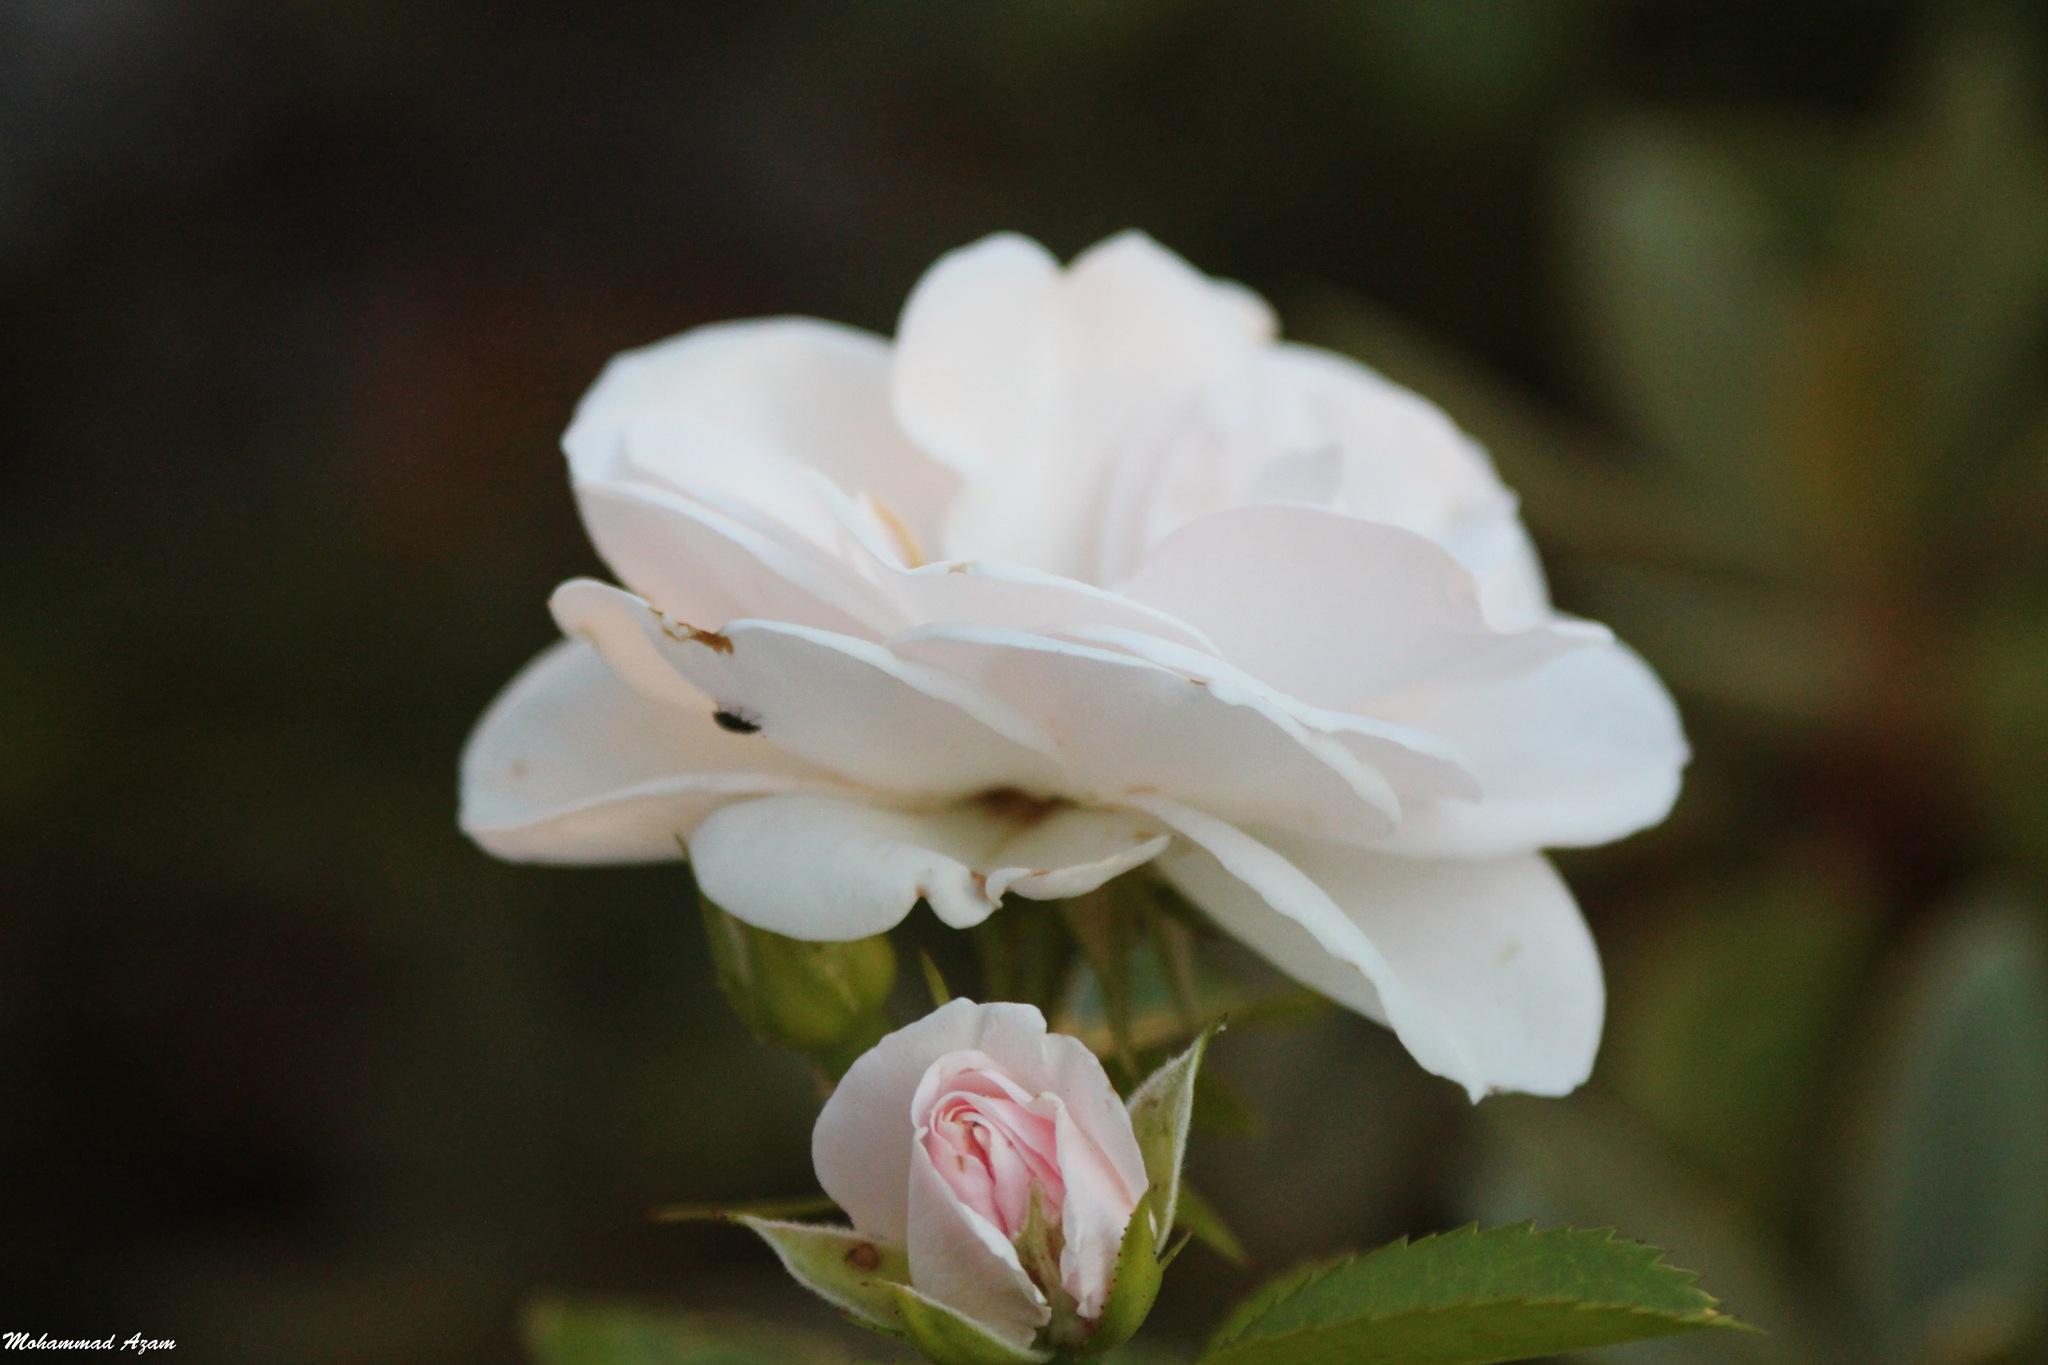 Flower 7 by Mohammad Azam